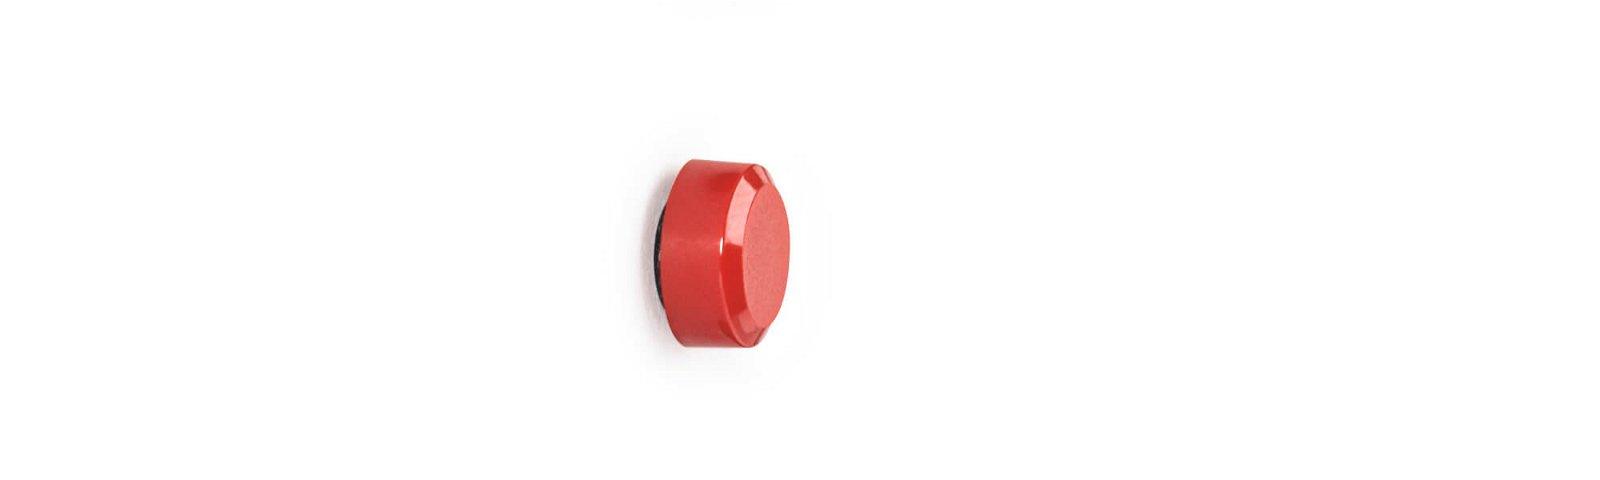 Facetterand-Magnet MAULpro SB Ø 15 mm, 0,17 kg, 8 St./Set, rot